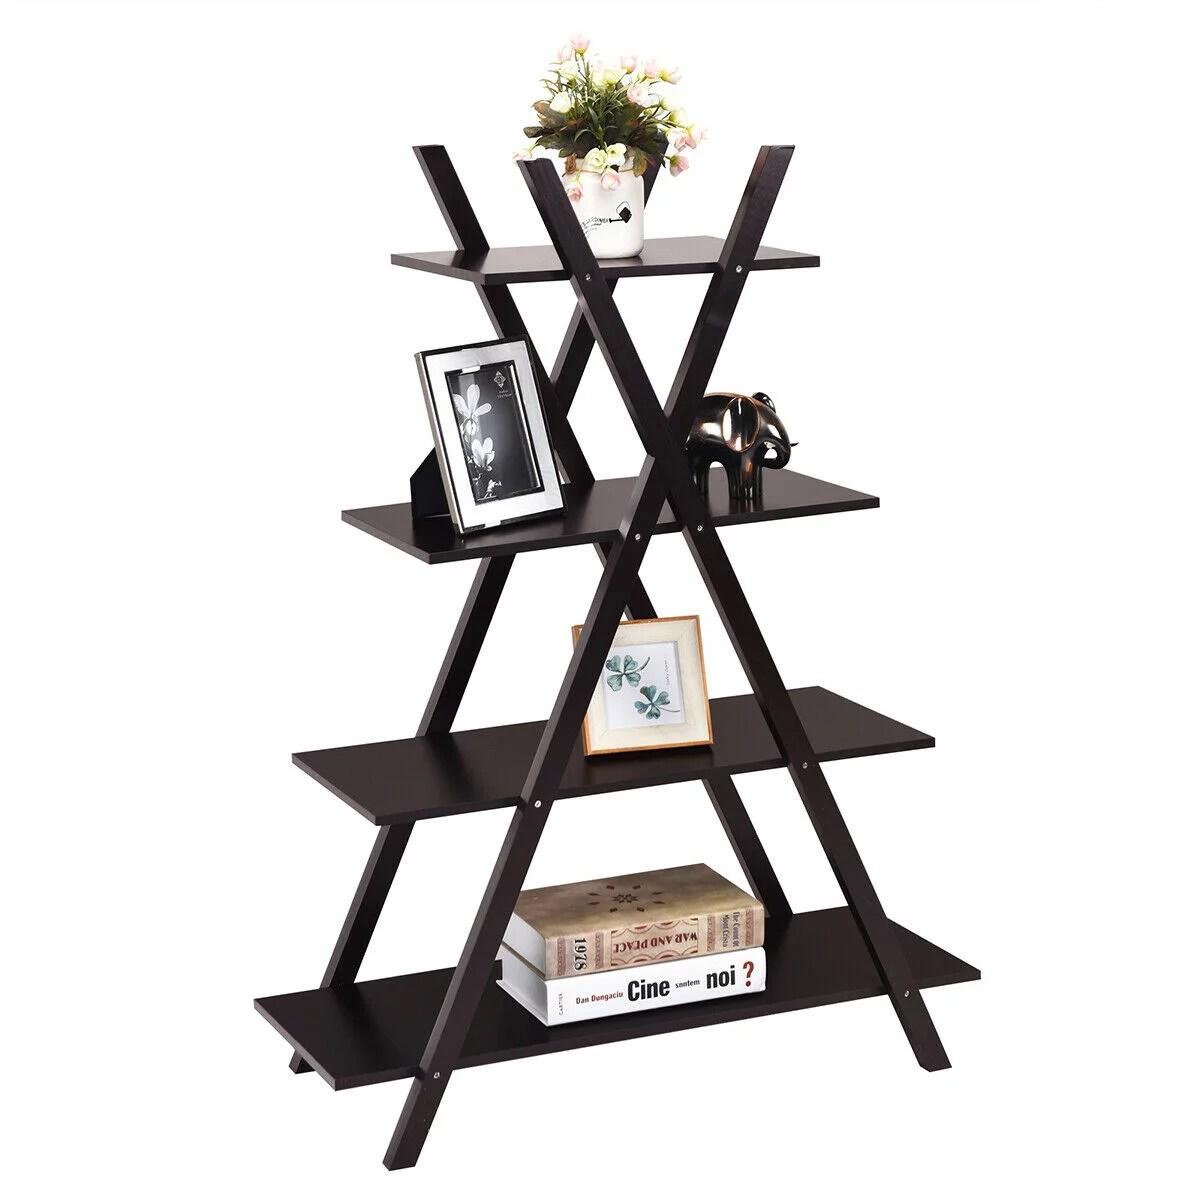 Costway 4 Tier Bookshelf Storage Display Shelves Bookcase Ladder X Shape Brown